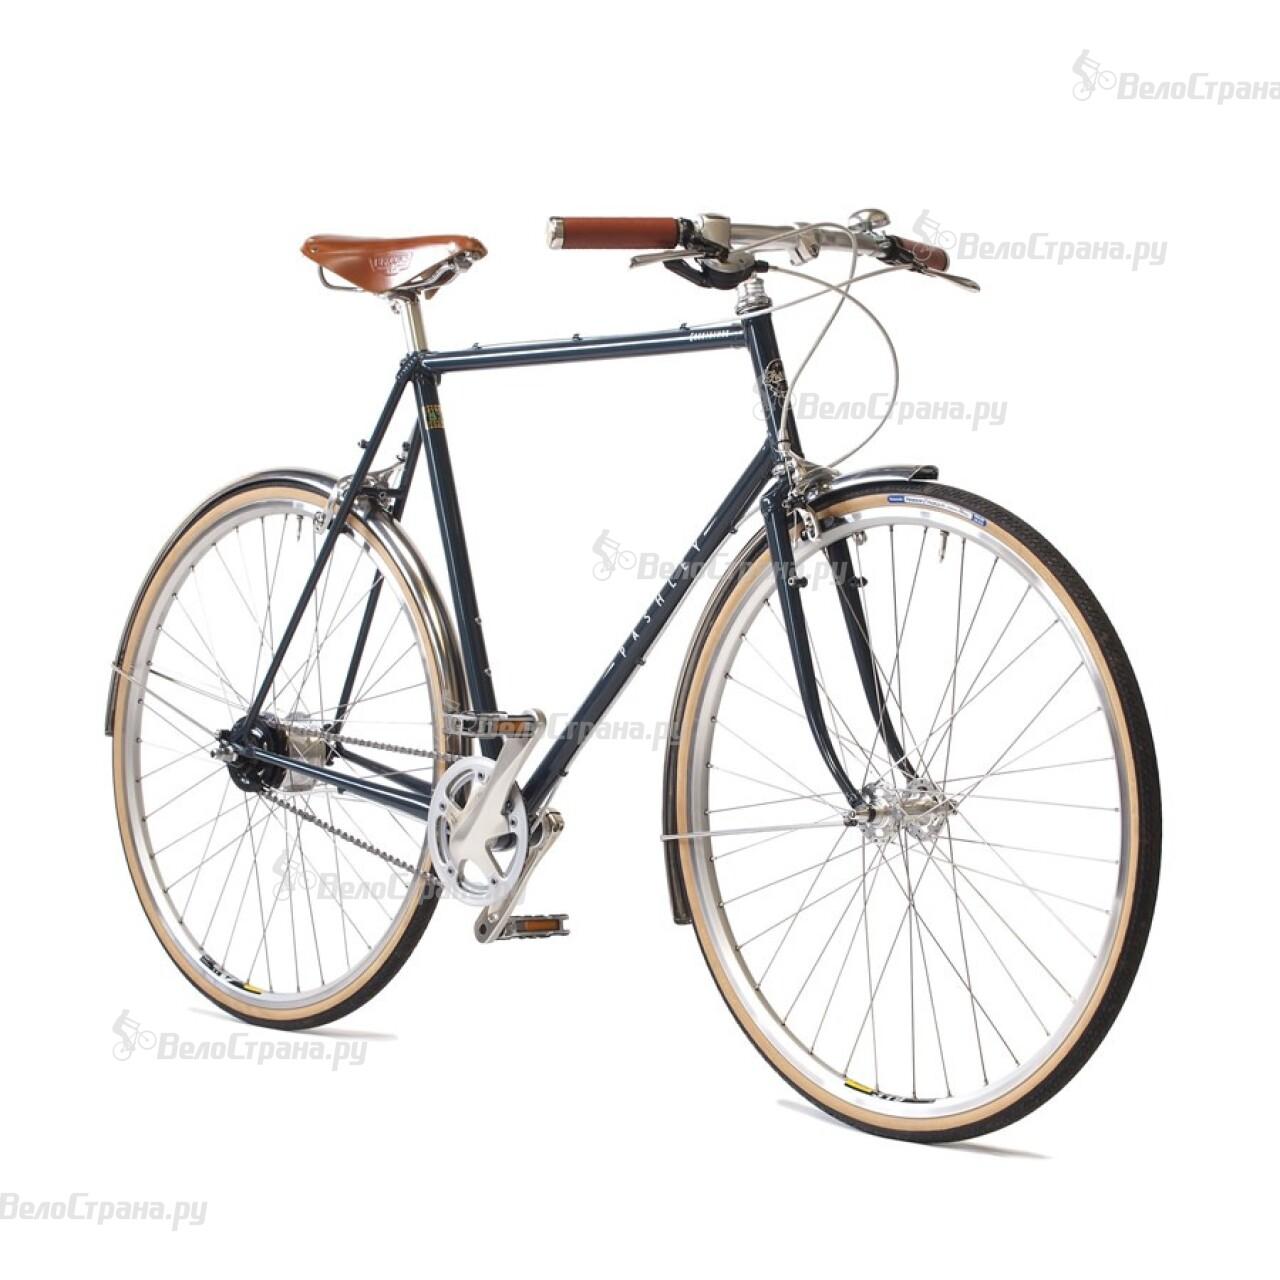 Велосипед Electra Countryman (2016) countryman guiding land use decisions